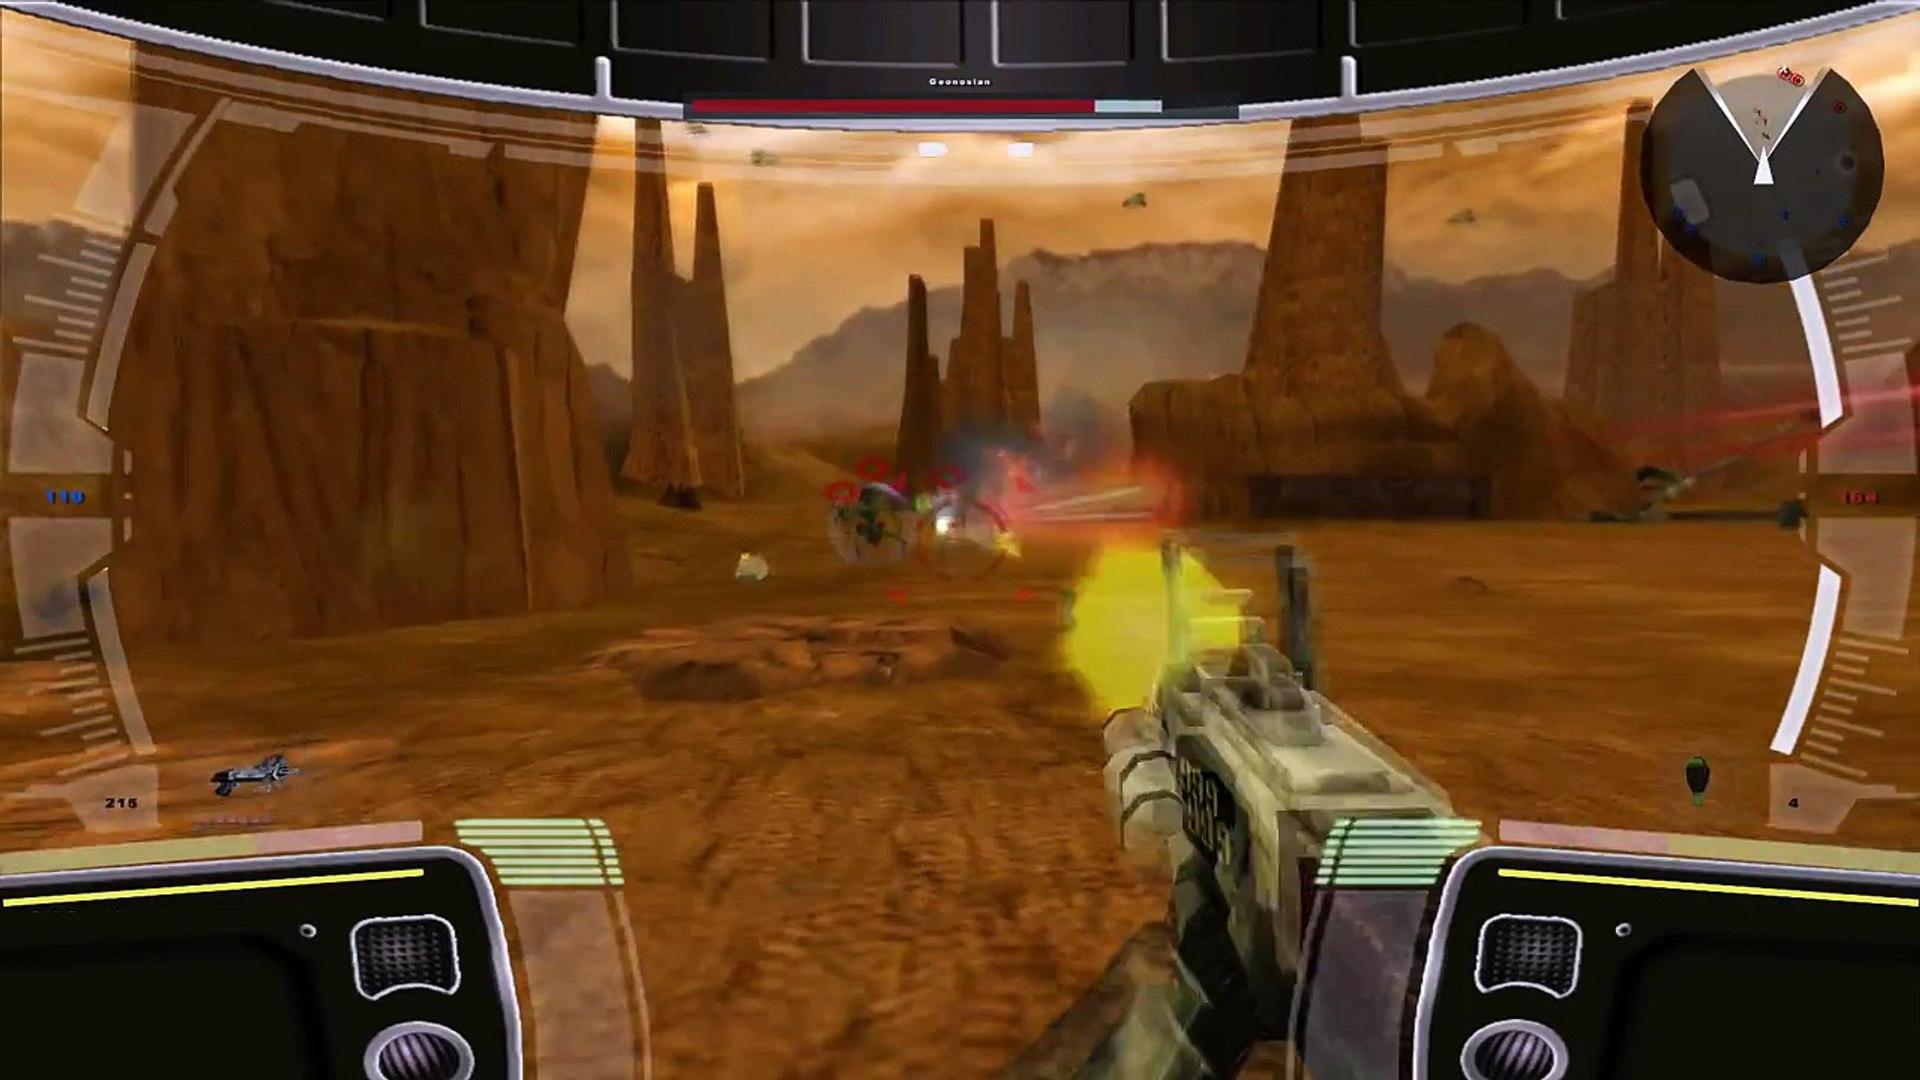 Star Wars Battlefront 2 Mods Hd Republic Commando Mod Kamino Geonosis Pc Video Dailymotion